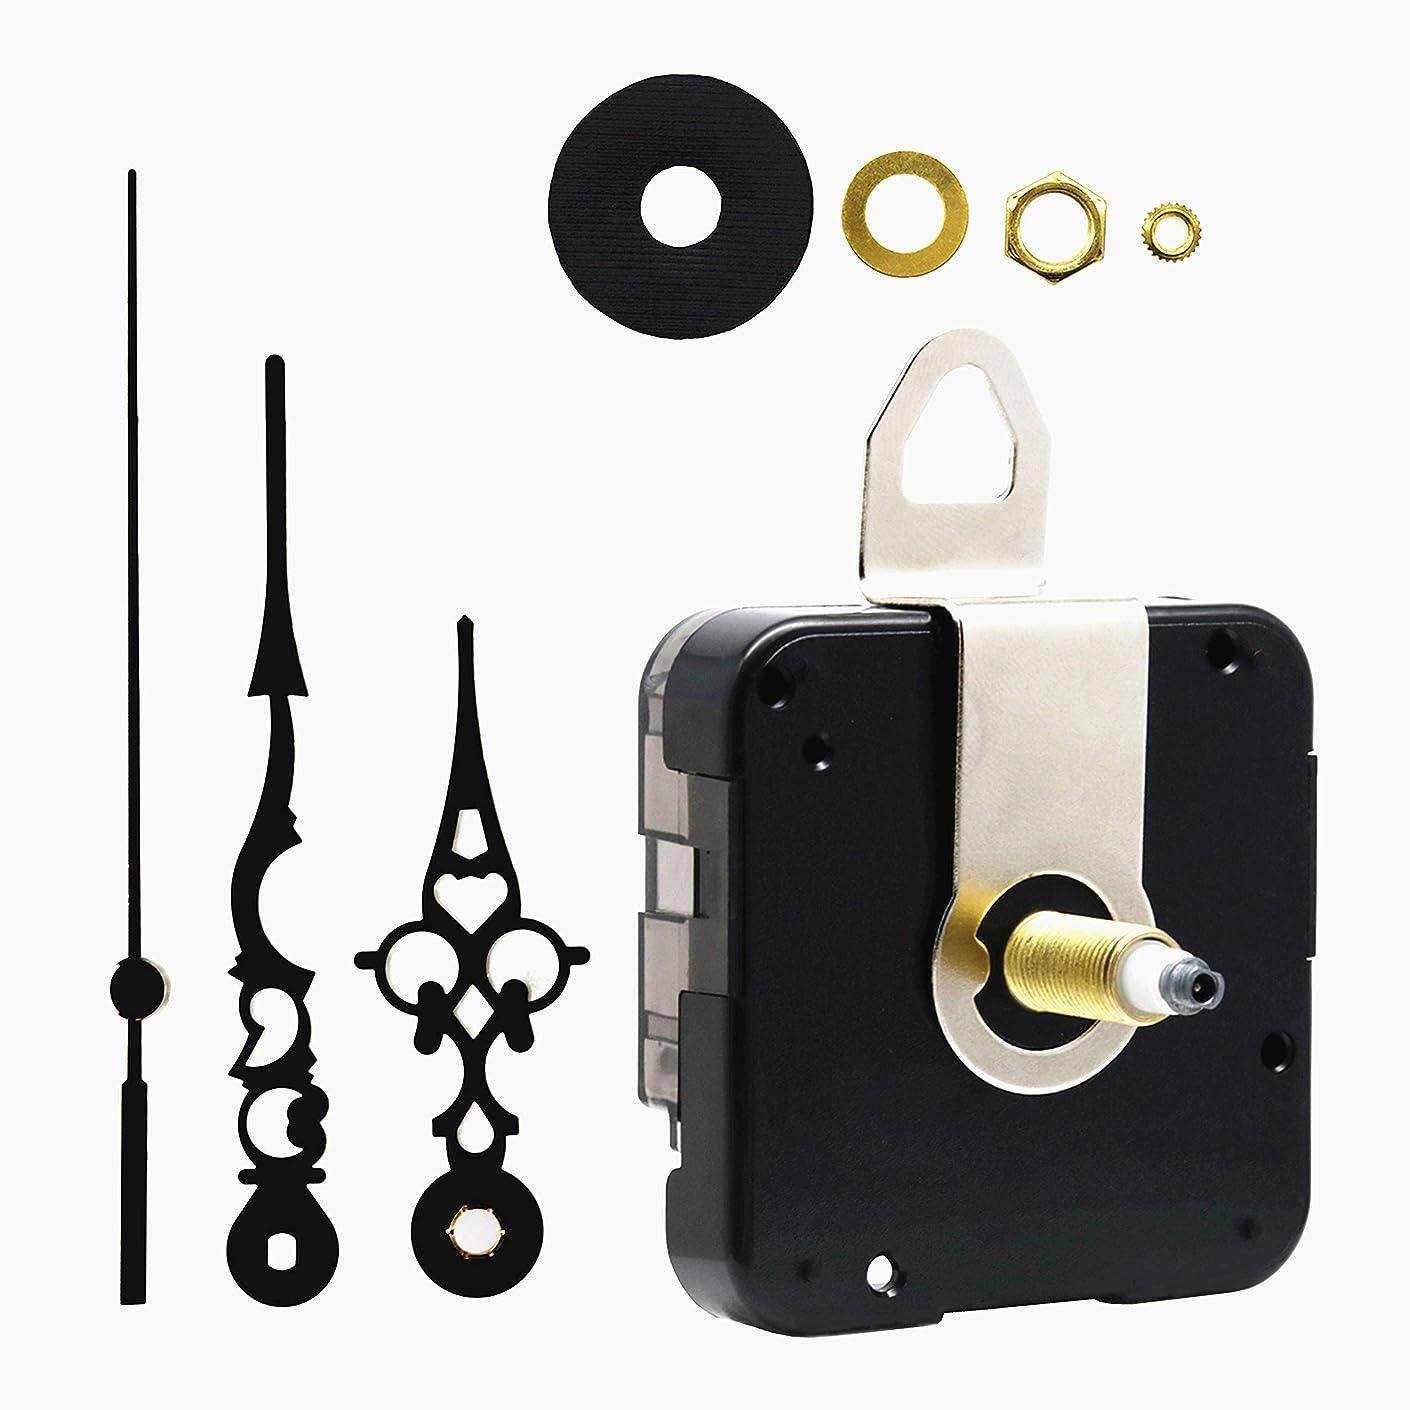 Quartz DIY Wall Clock Movement Mechanism Battery Operated DIY Repair Parts Replacement,1/2 Inch Maximum Dial Thickness, 59/64 Inch Total Shaft Length.